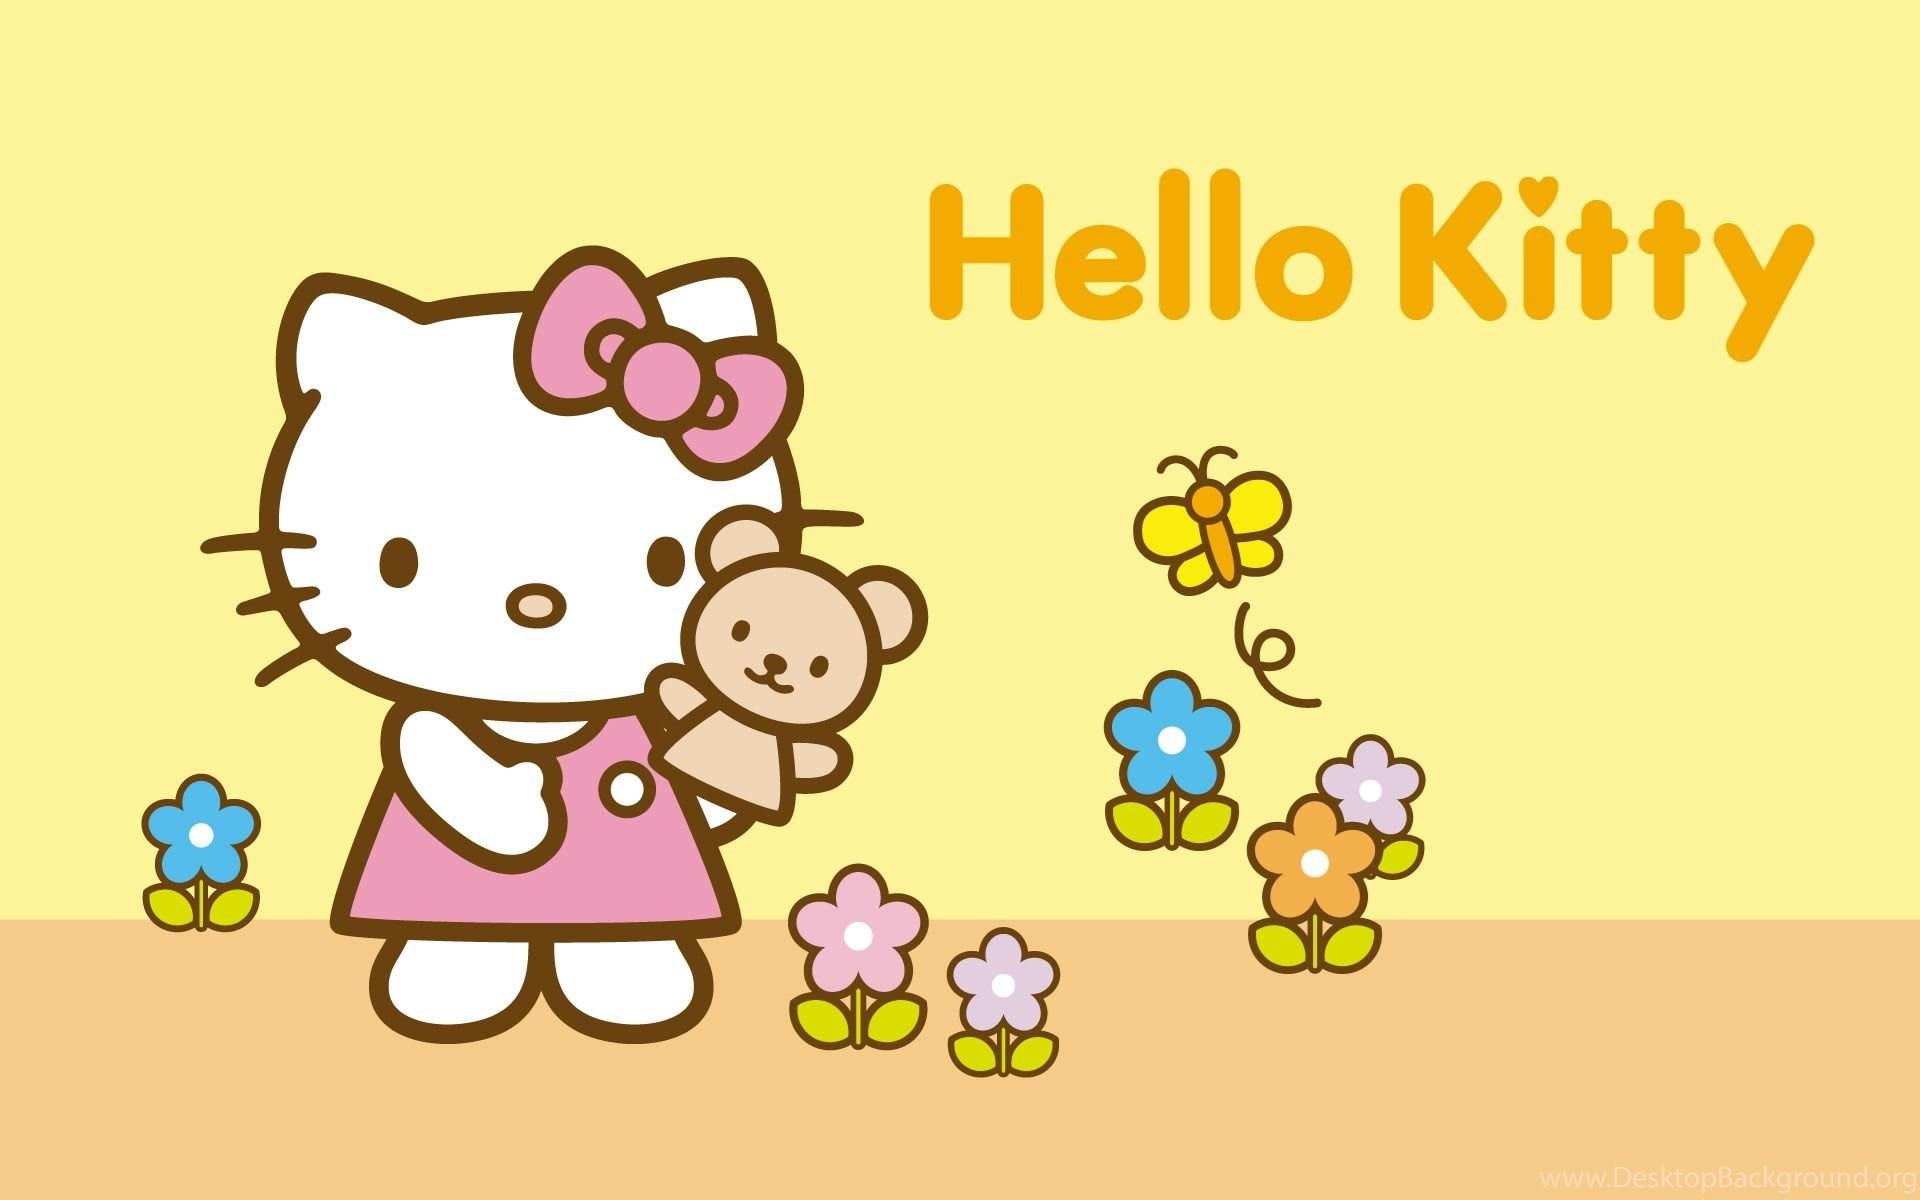 Wonderful Wallpaper Halloween Hello Kitty - 635606_free-hello-kitty-halloween-wallpapers-wallpapers-cave_1920x1200_h  Pic_516540.jpg